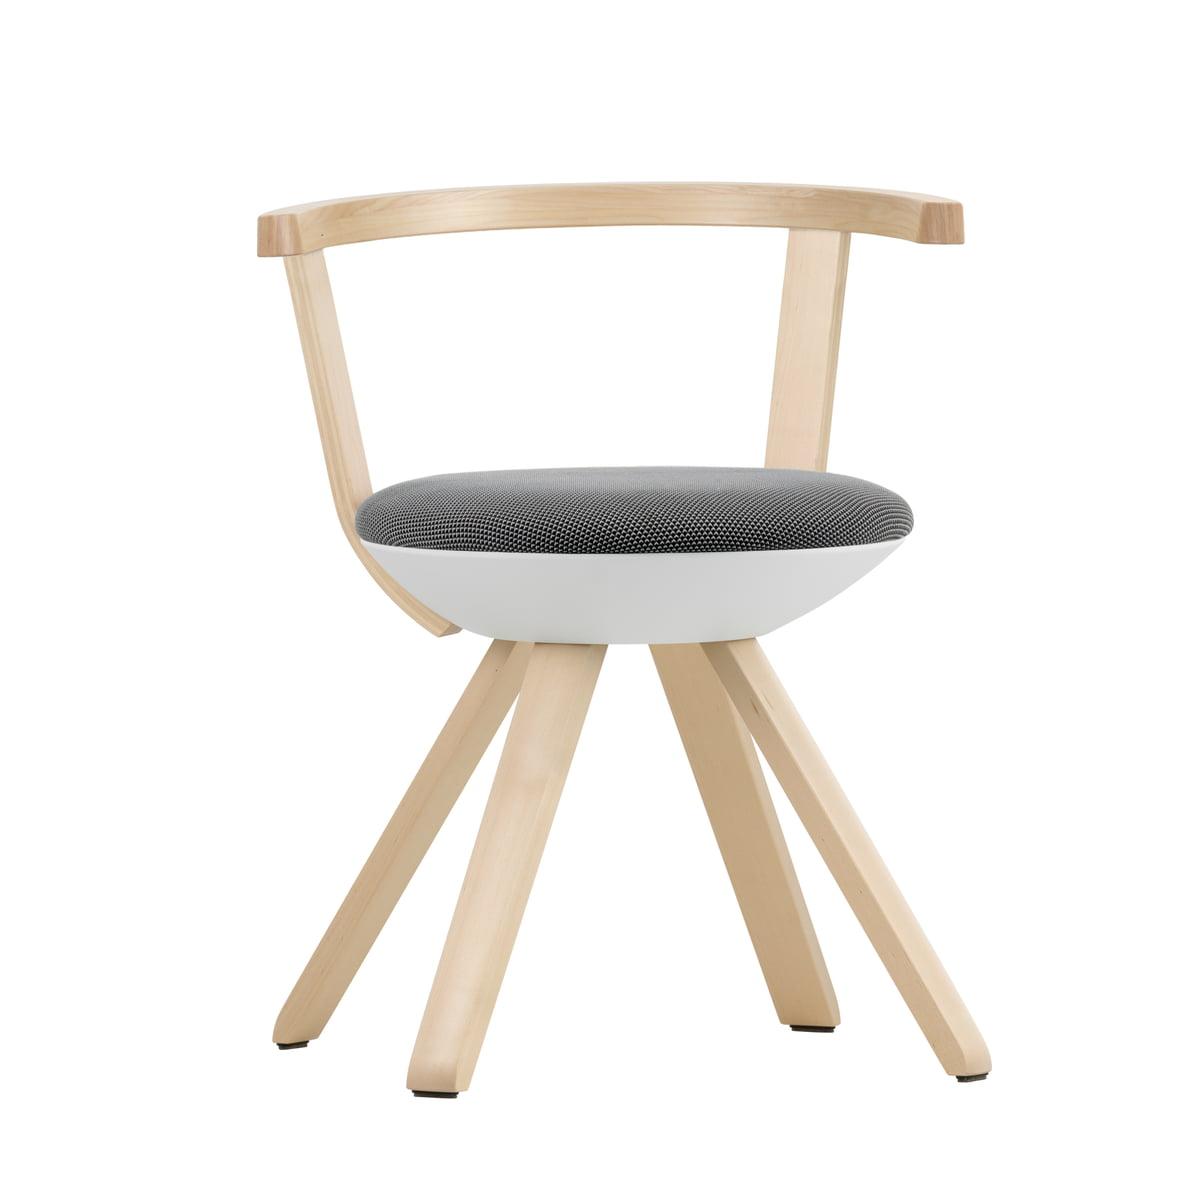 Artek Dress The Chair : The rival chair by artek in our interior design shop